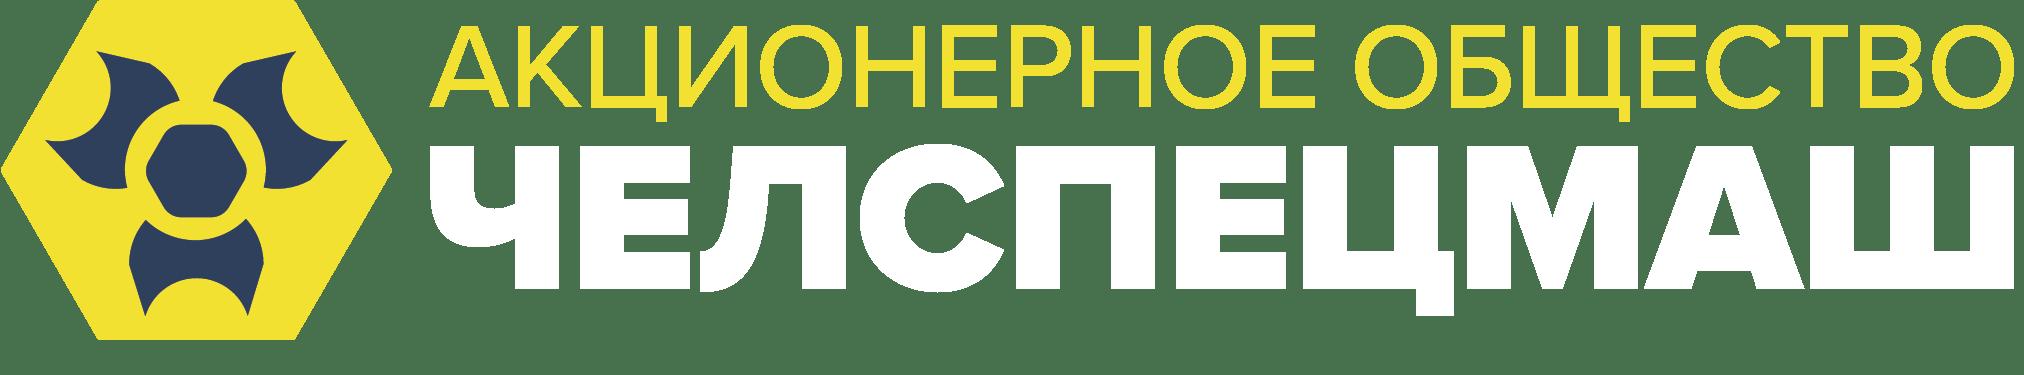 АО Челспецмаш - производство систем контроля